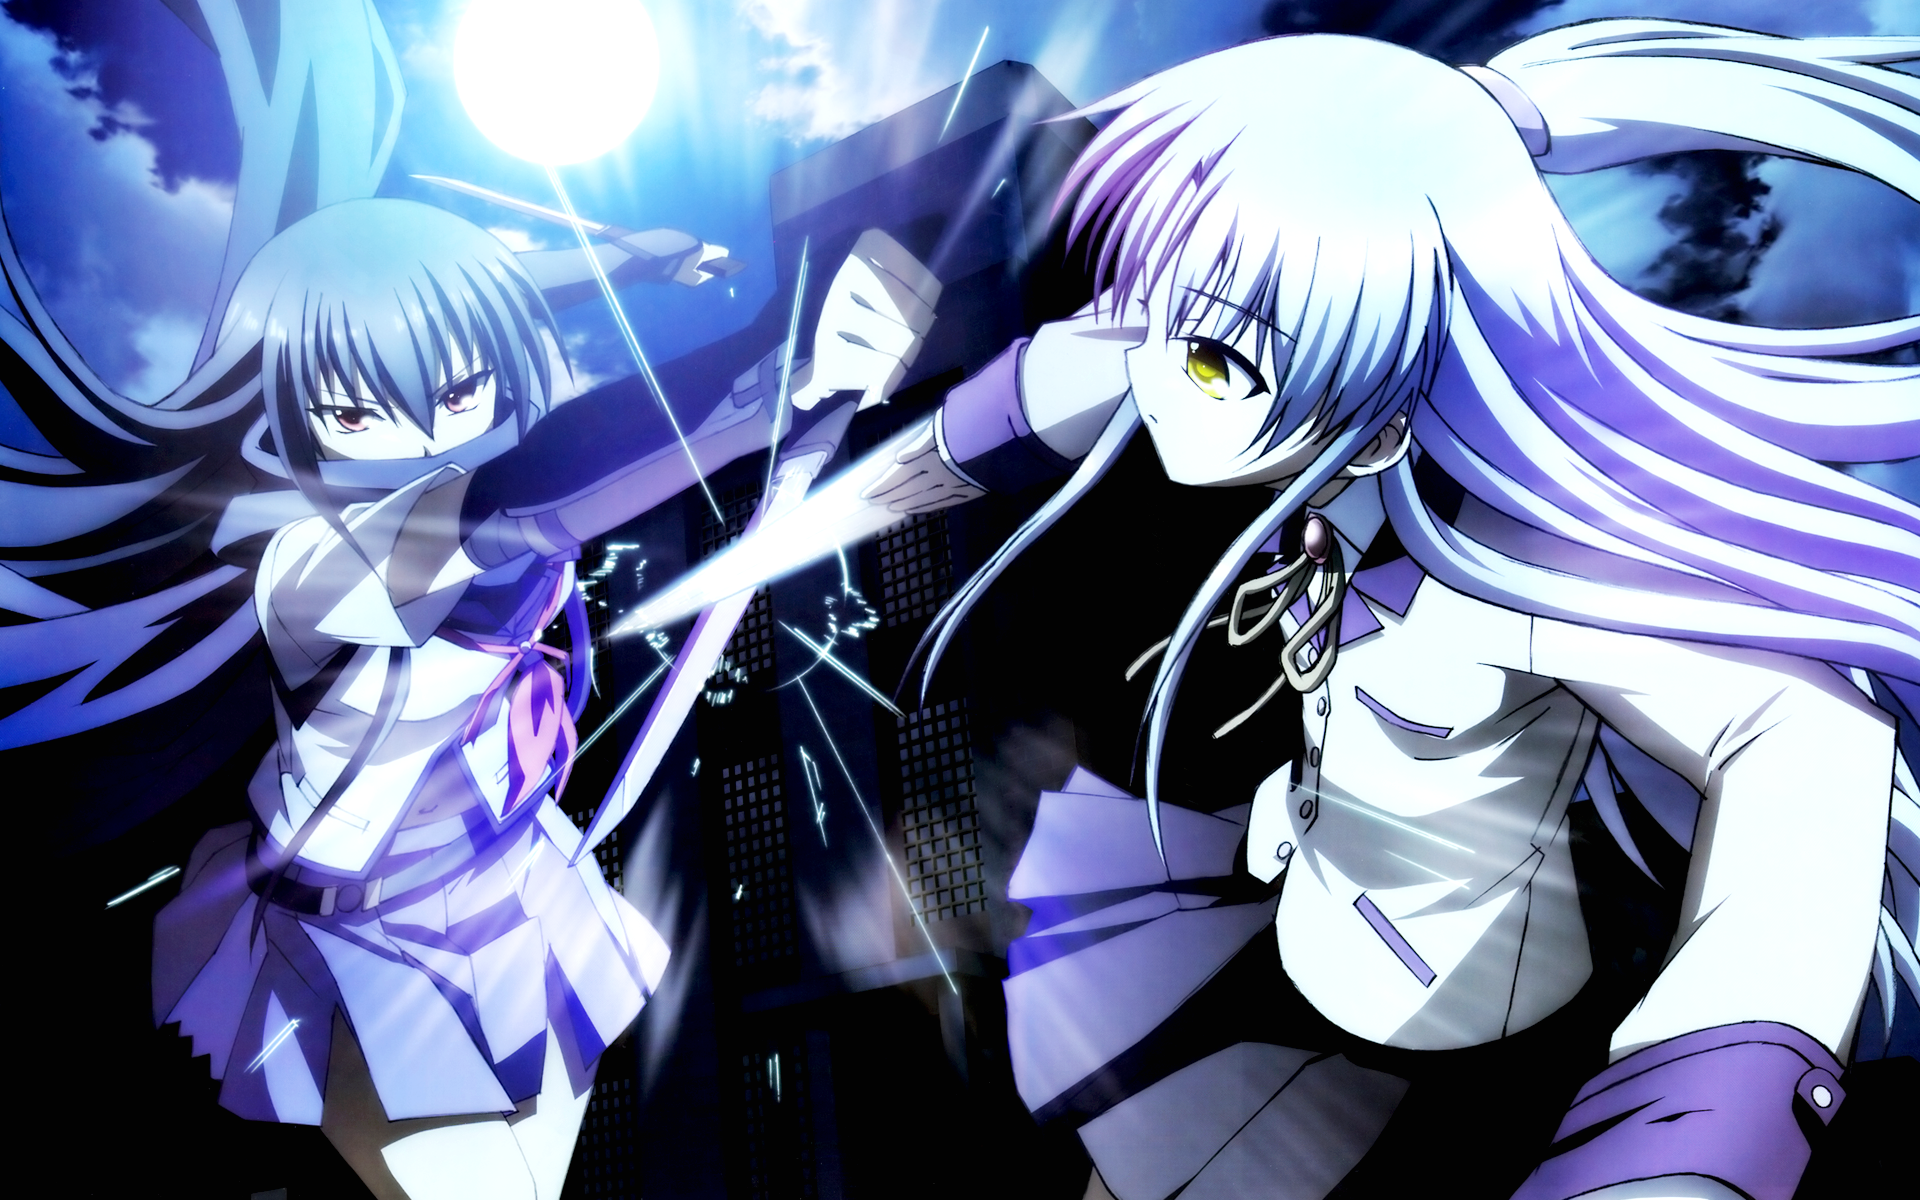 Shiina [Angel Beats ] images Shiina vs Tenshi 1 HD wallpaper and